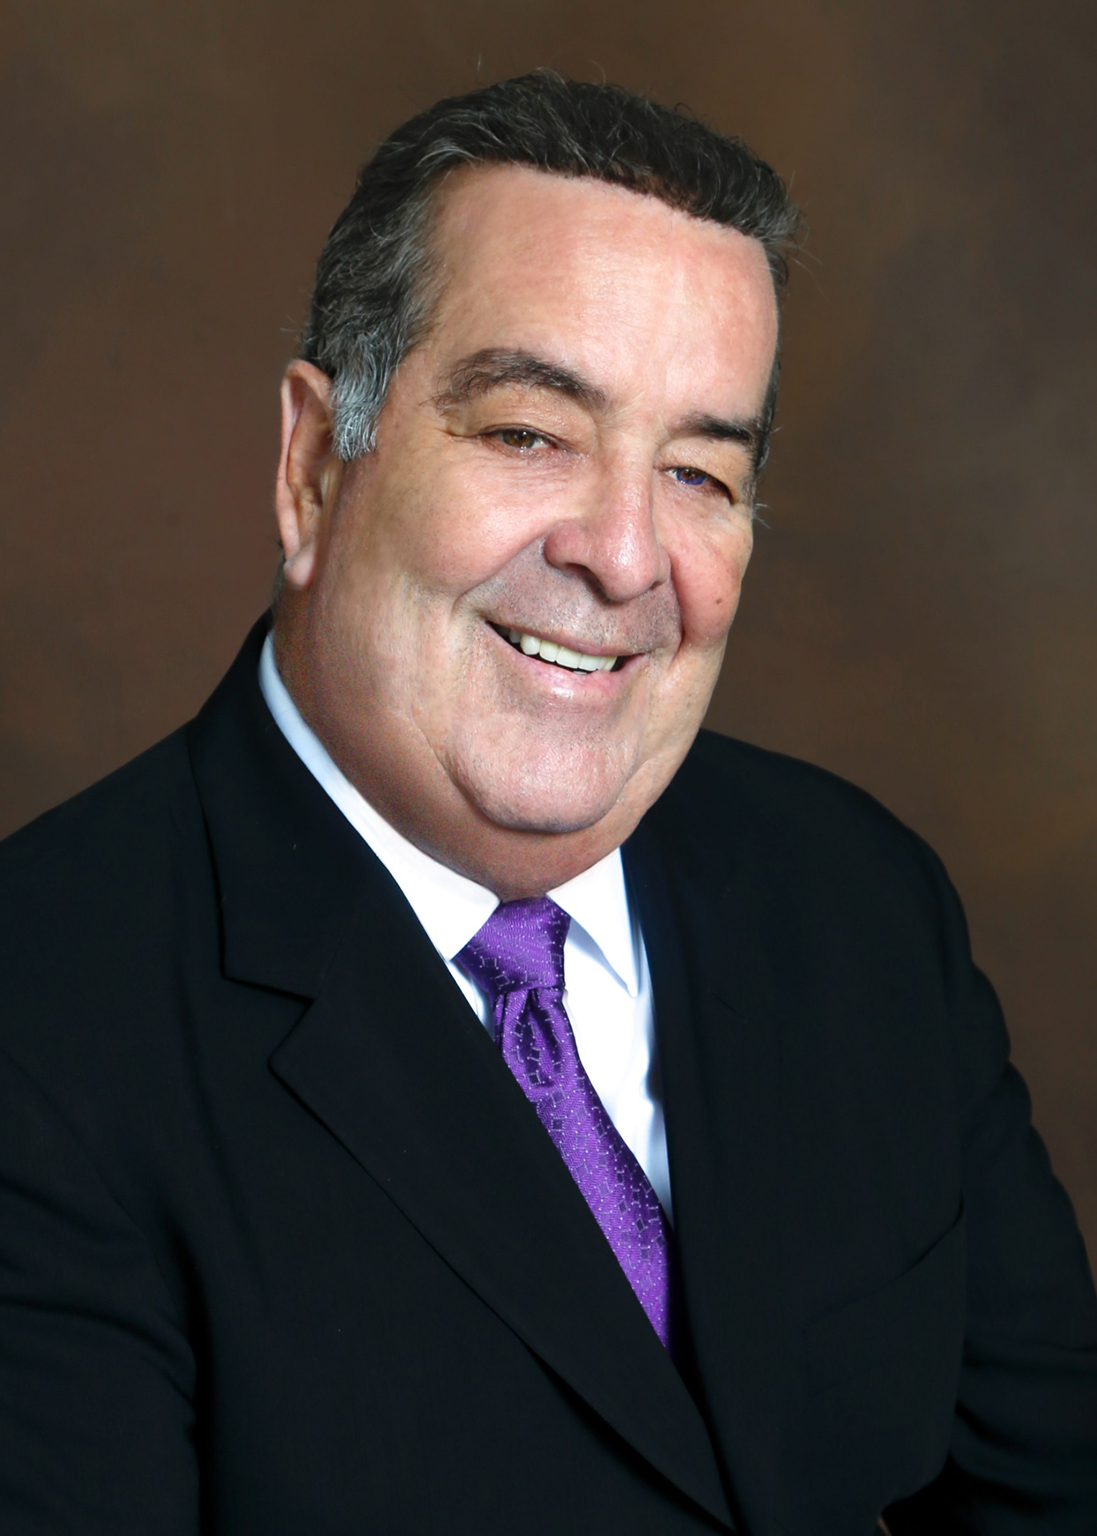 Louis Nevarez - Director of Sales